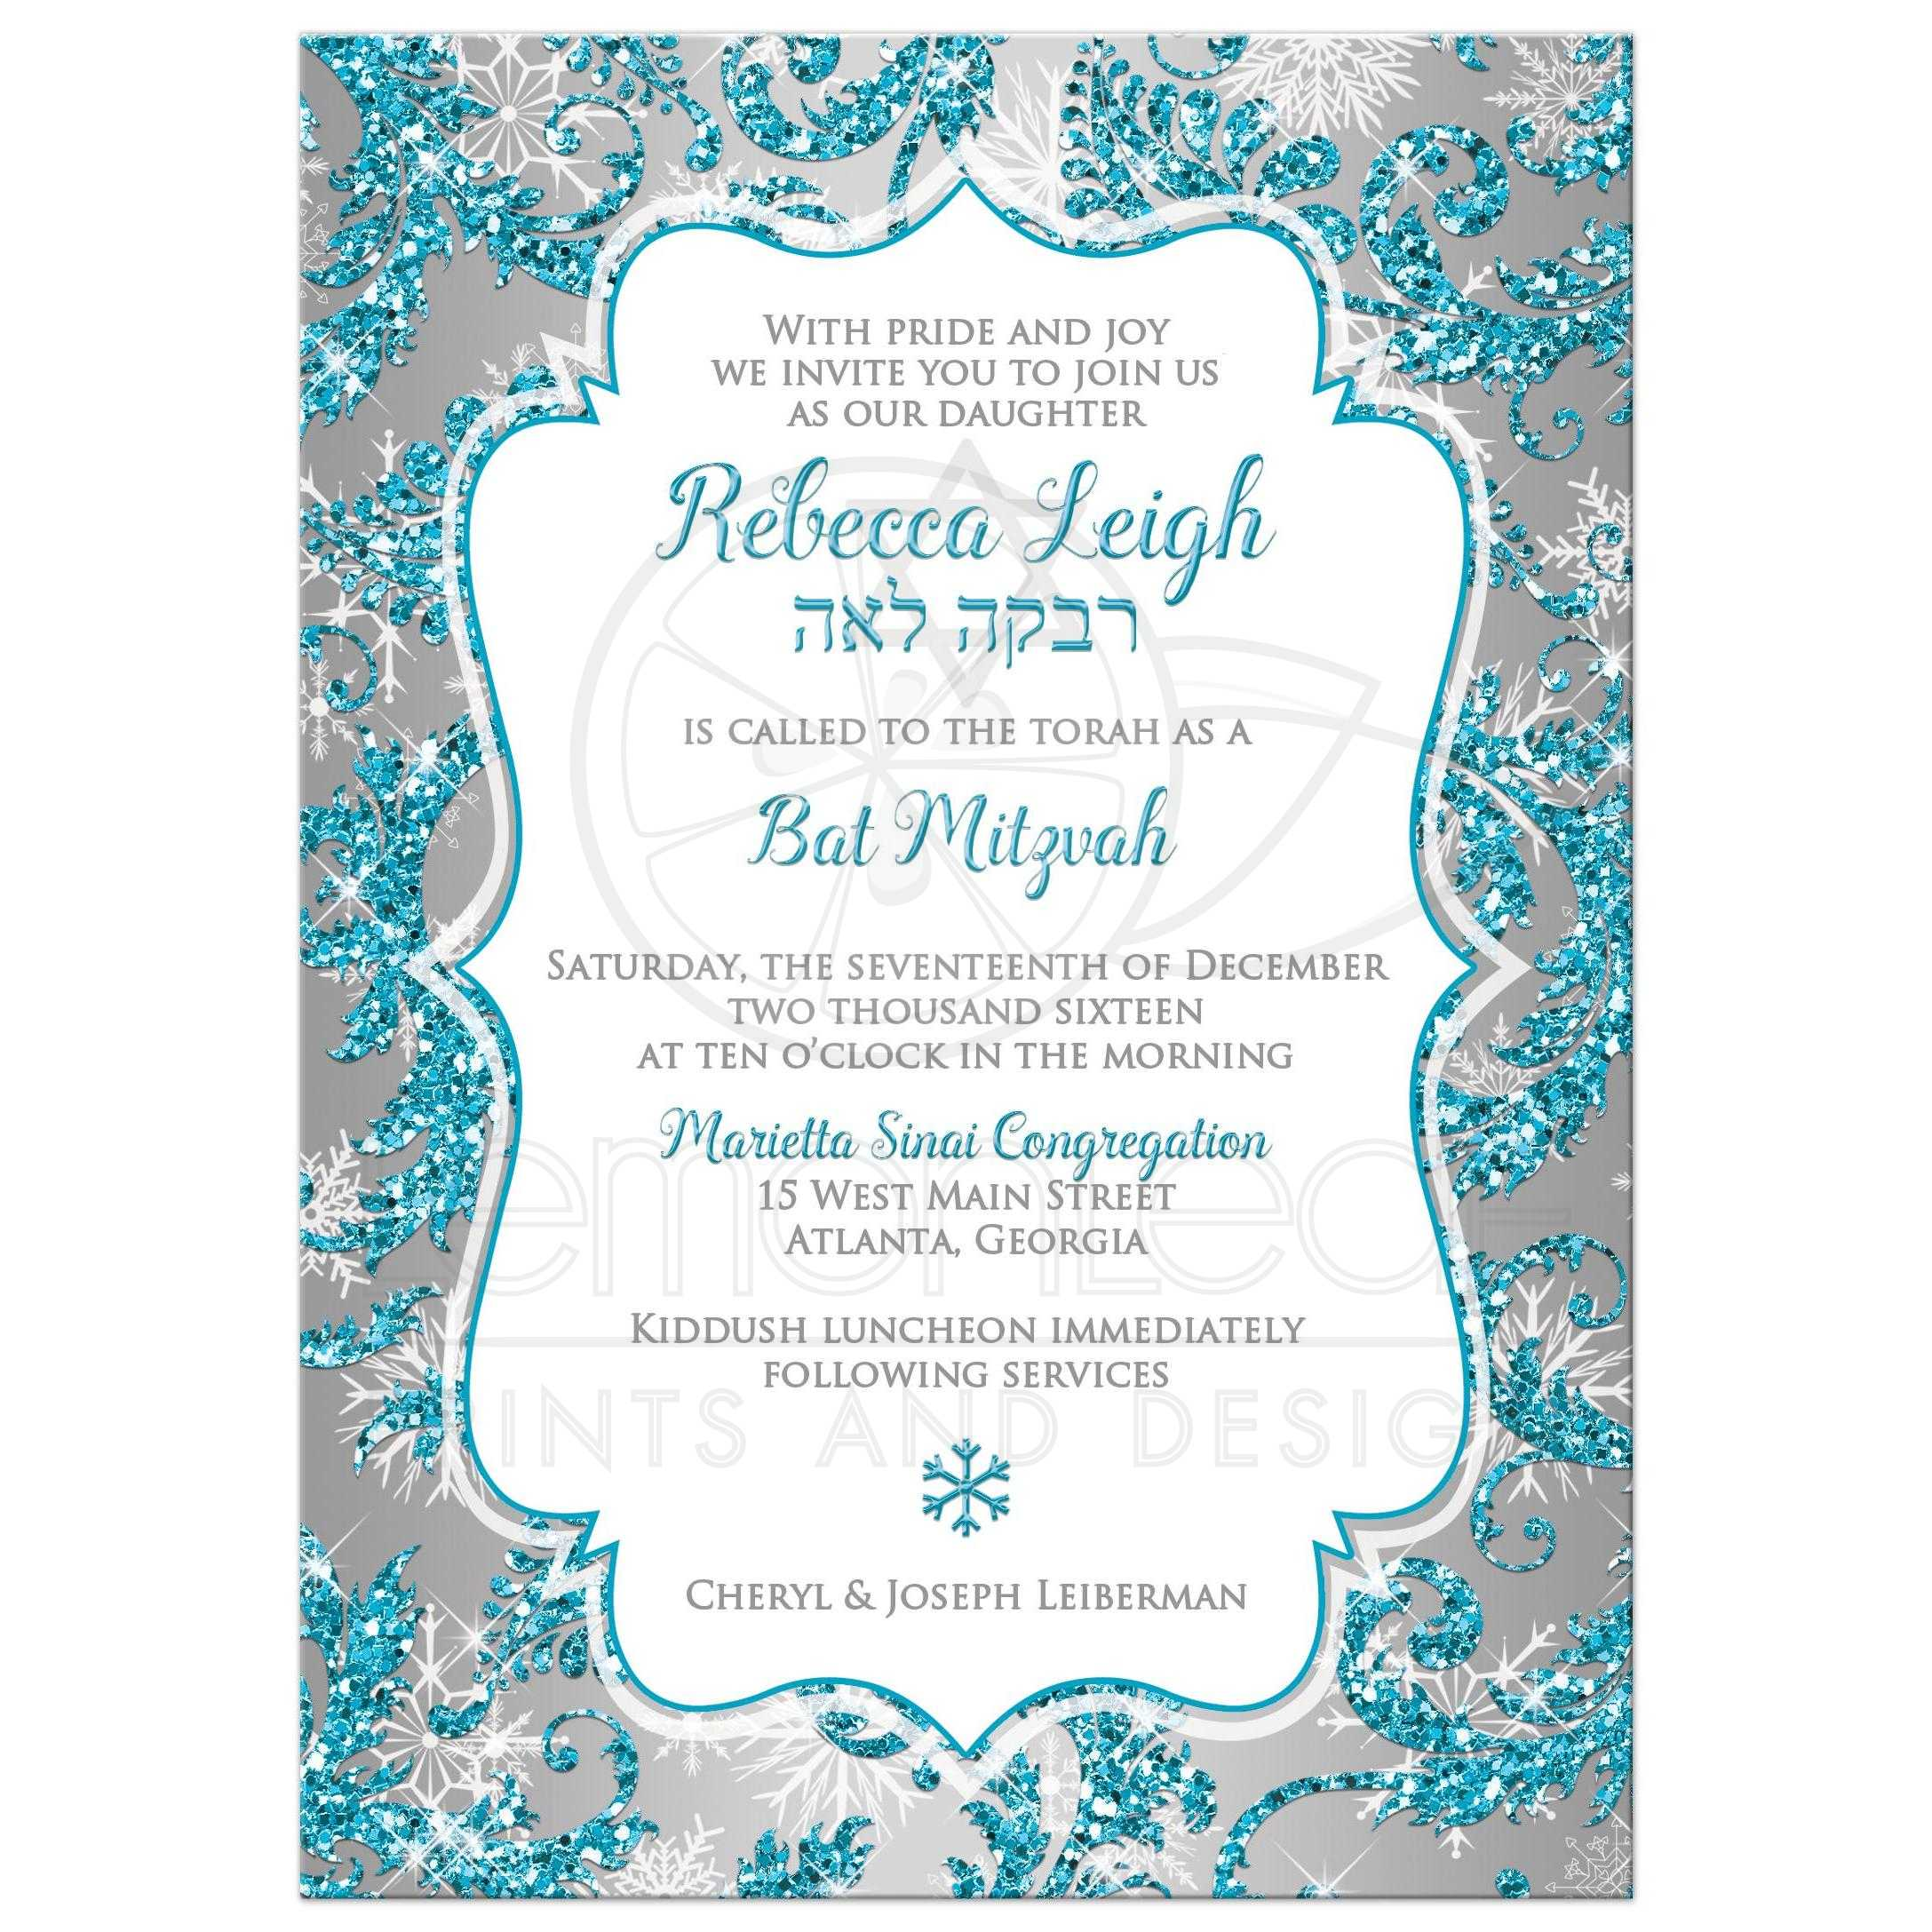 Bat Mitzvah Invitation | Winter Wonderland Turquoise, Silver, Faux ...